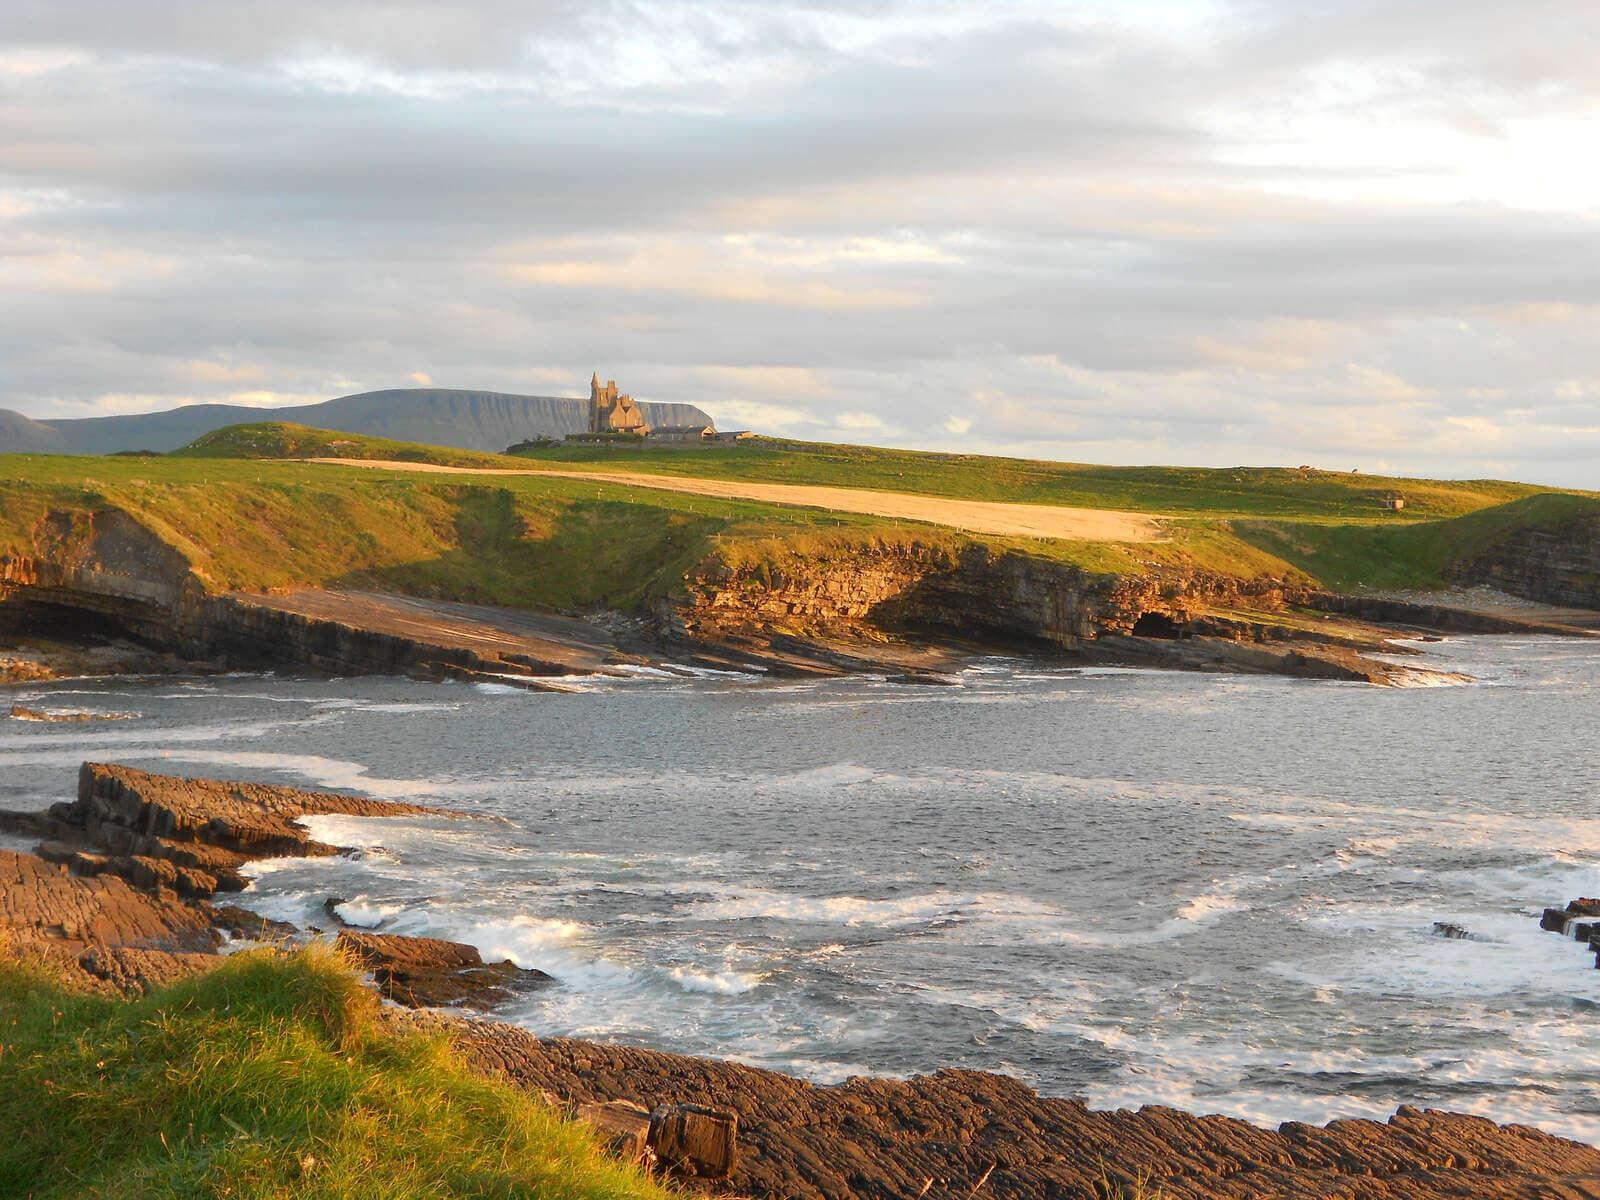 Mullaghmore Head, Co Sligo